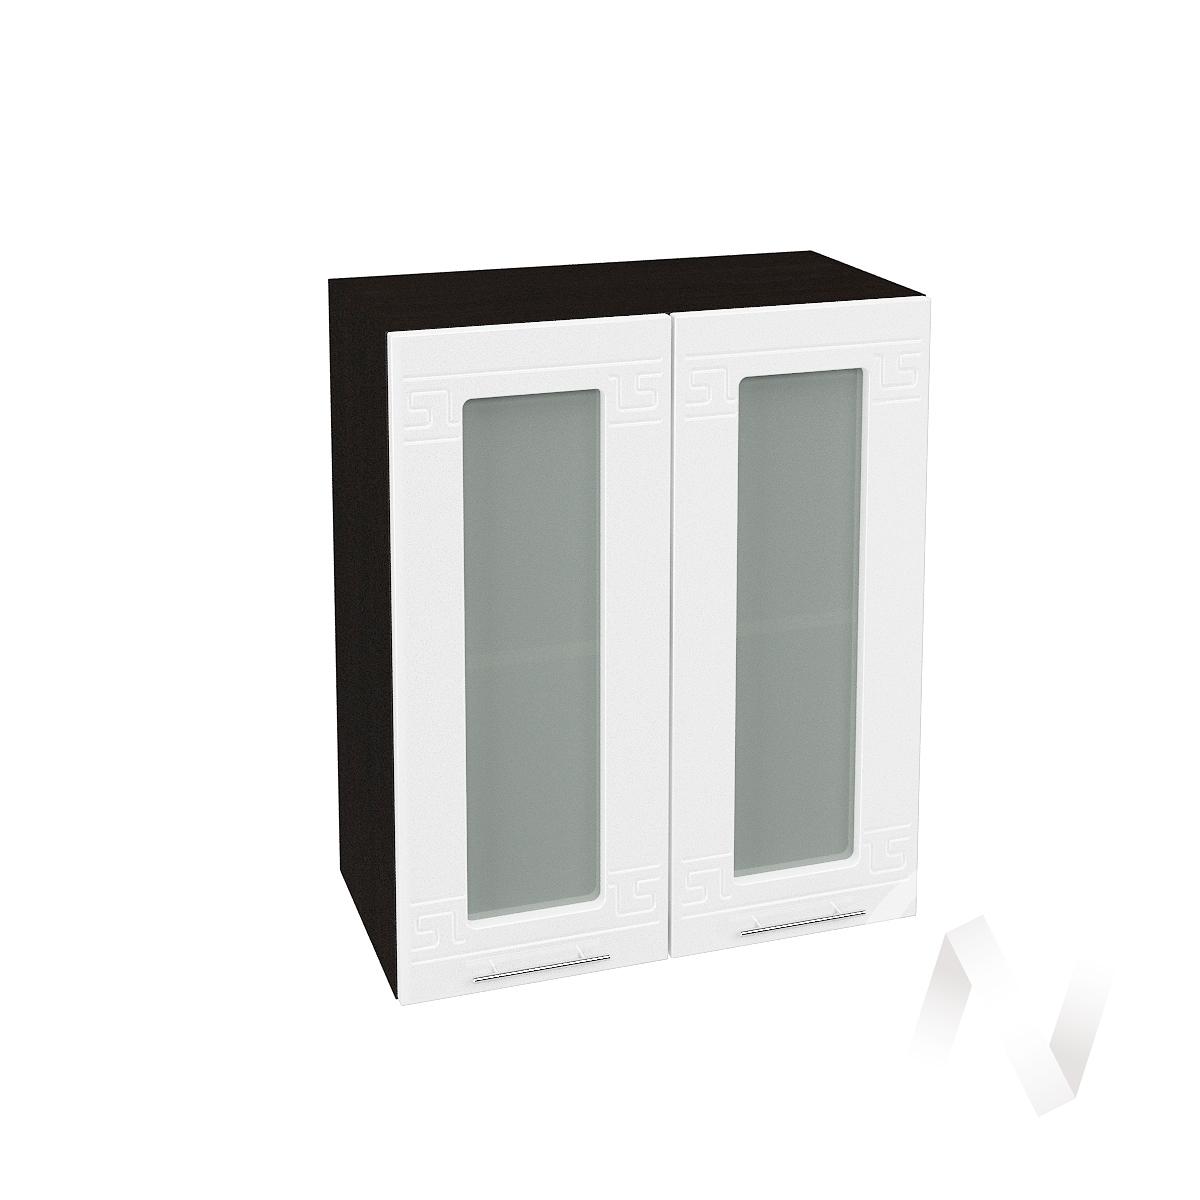 "Кухня ""Греция"": Шкаф верхний со стеклом 600, ШВС 600 (белый металлик/корпус венге)"